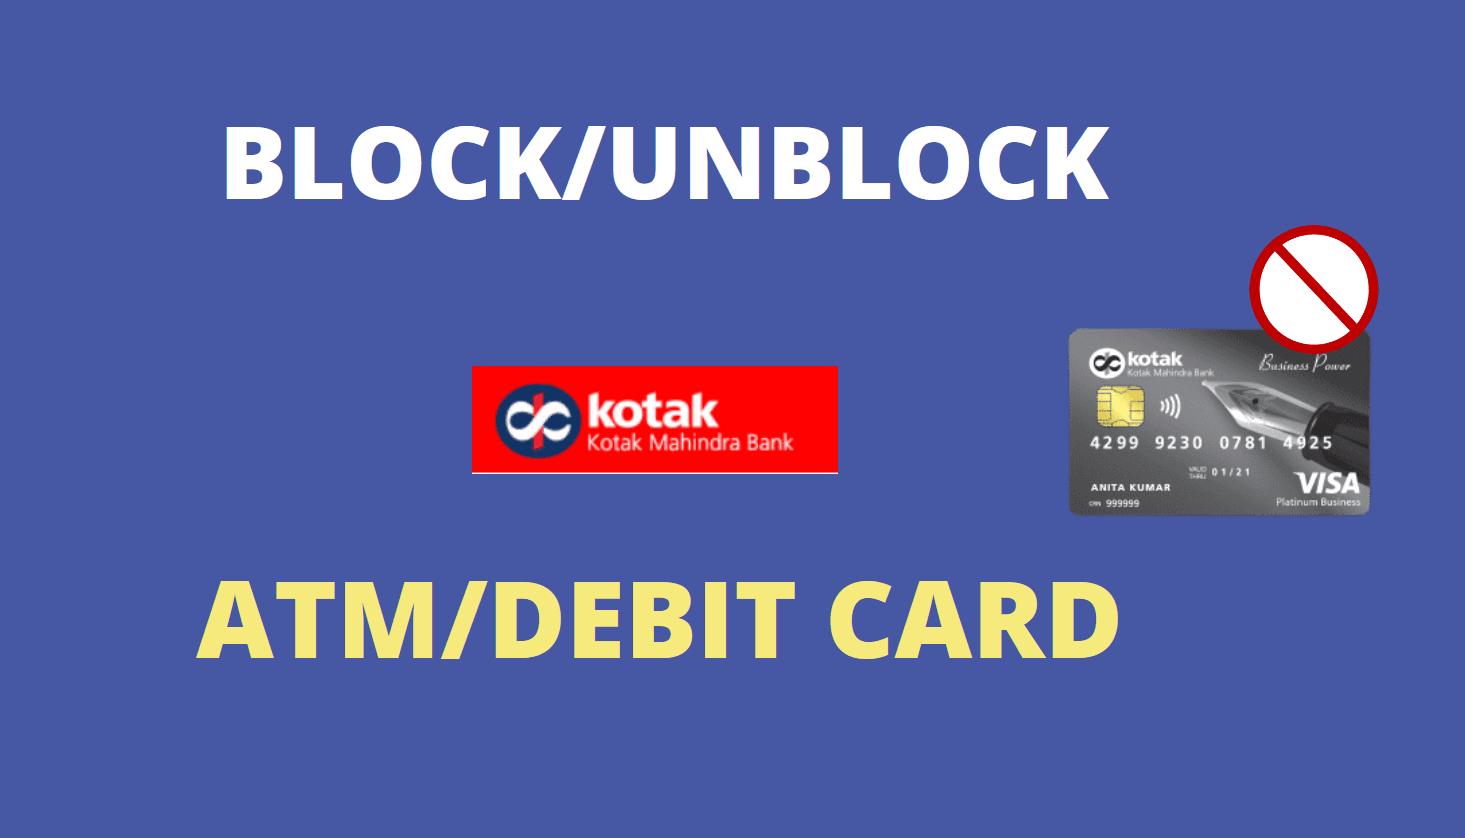 Block or Unblock Kotak Mahindra Bank Debit Card online